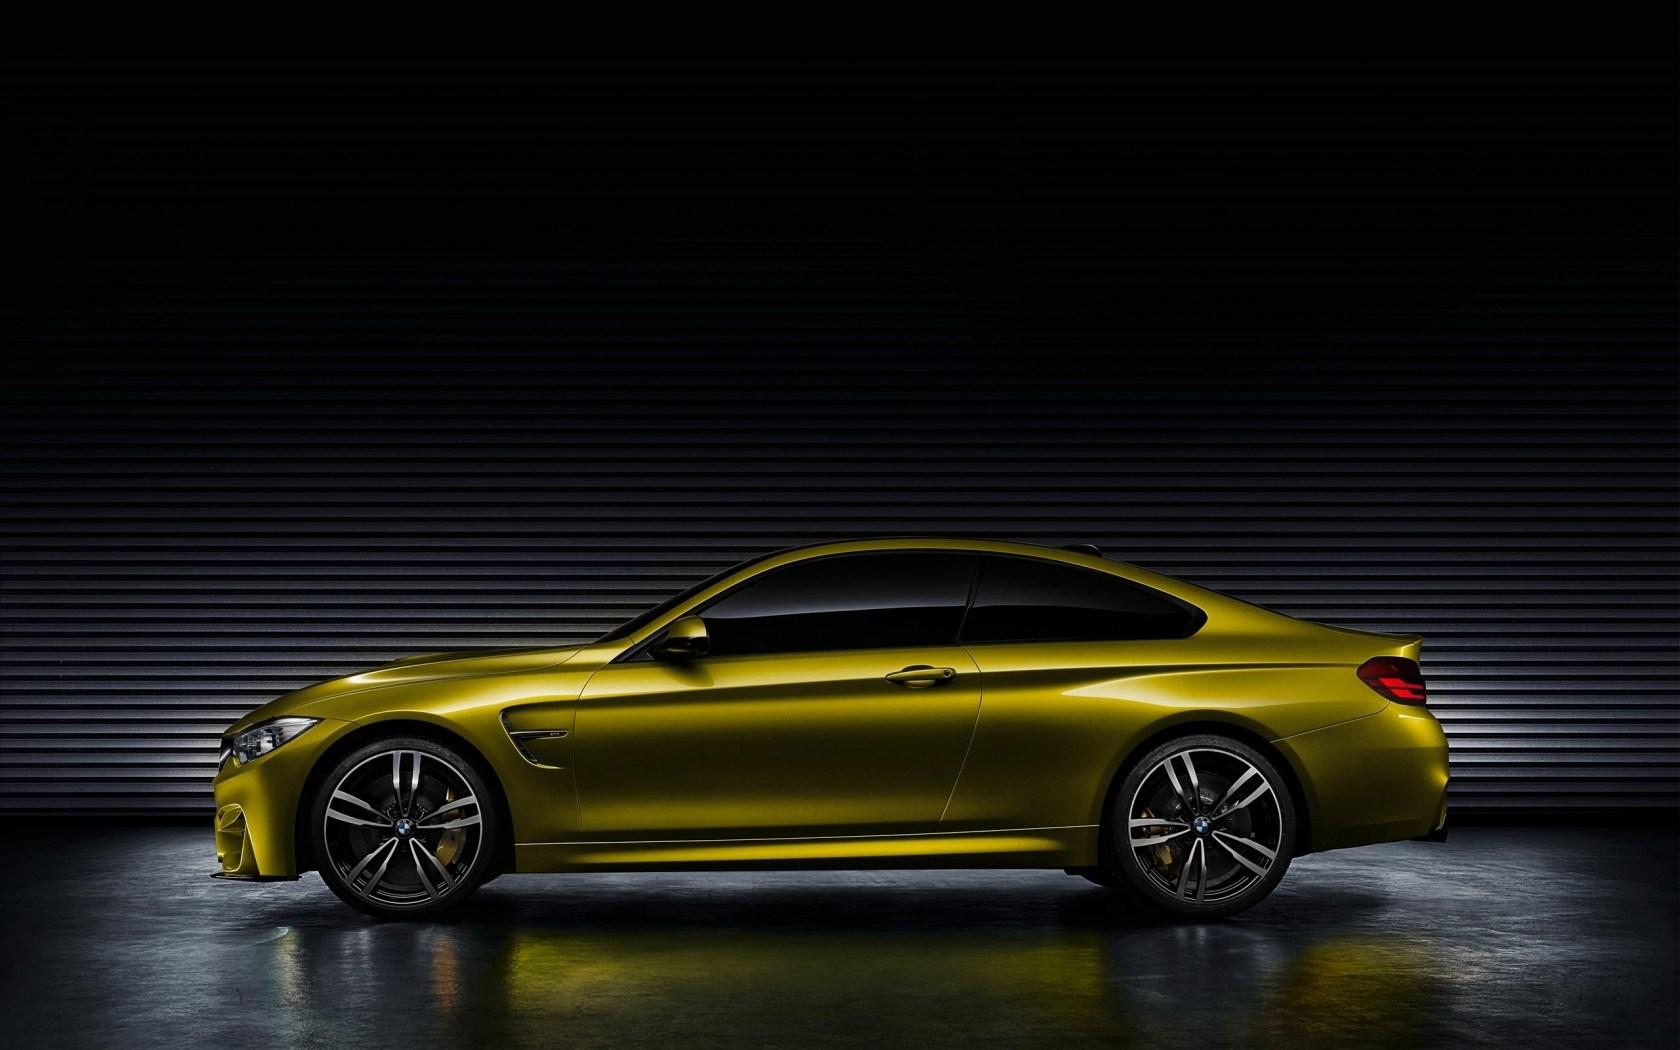 BMW M4 Coupe Concept Car Side